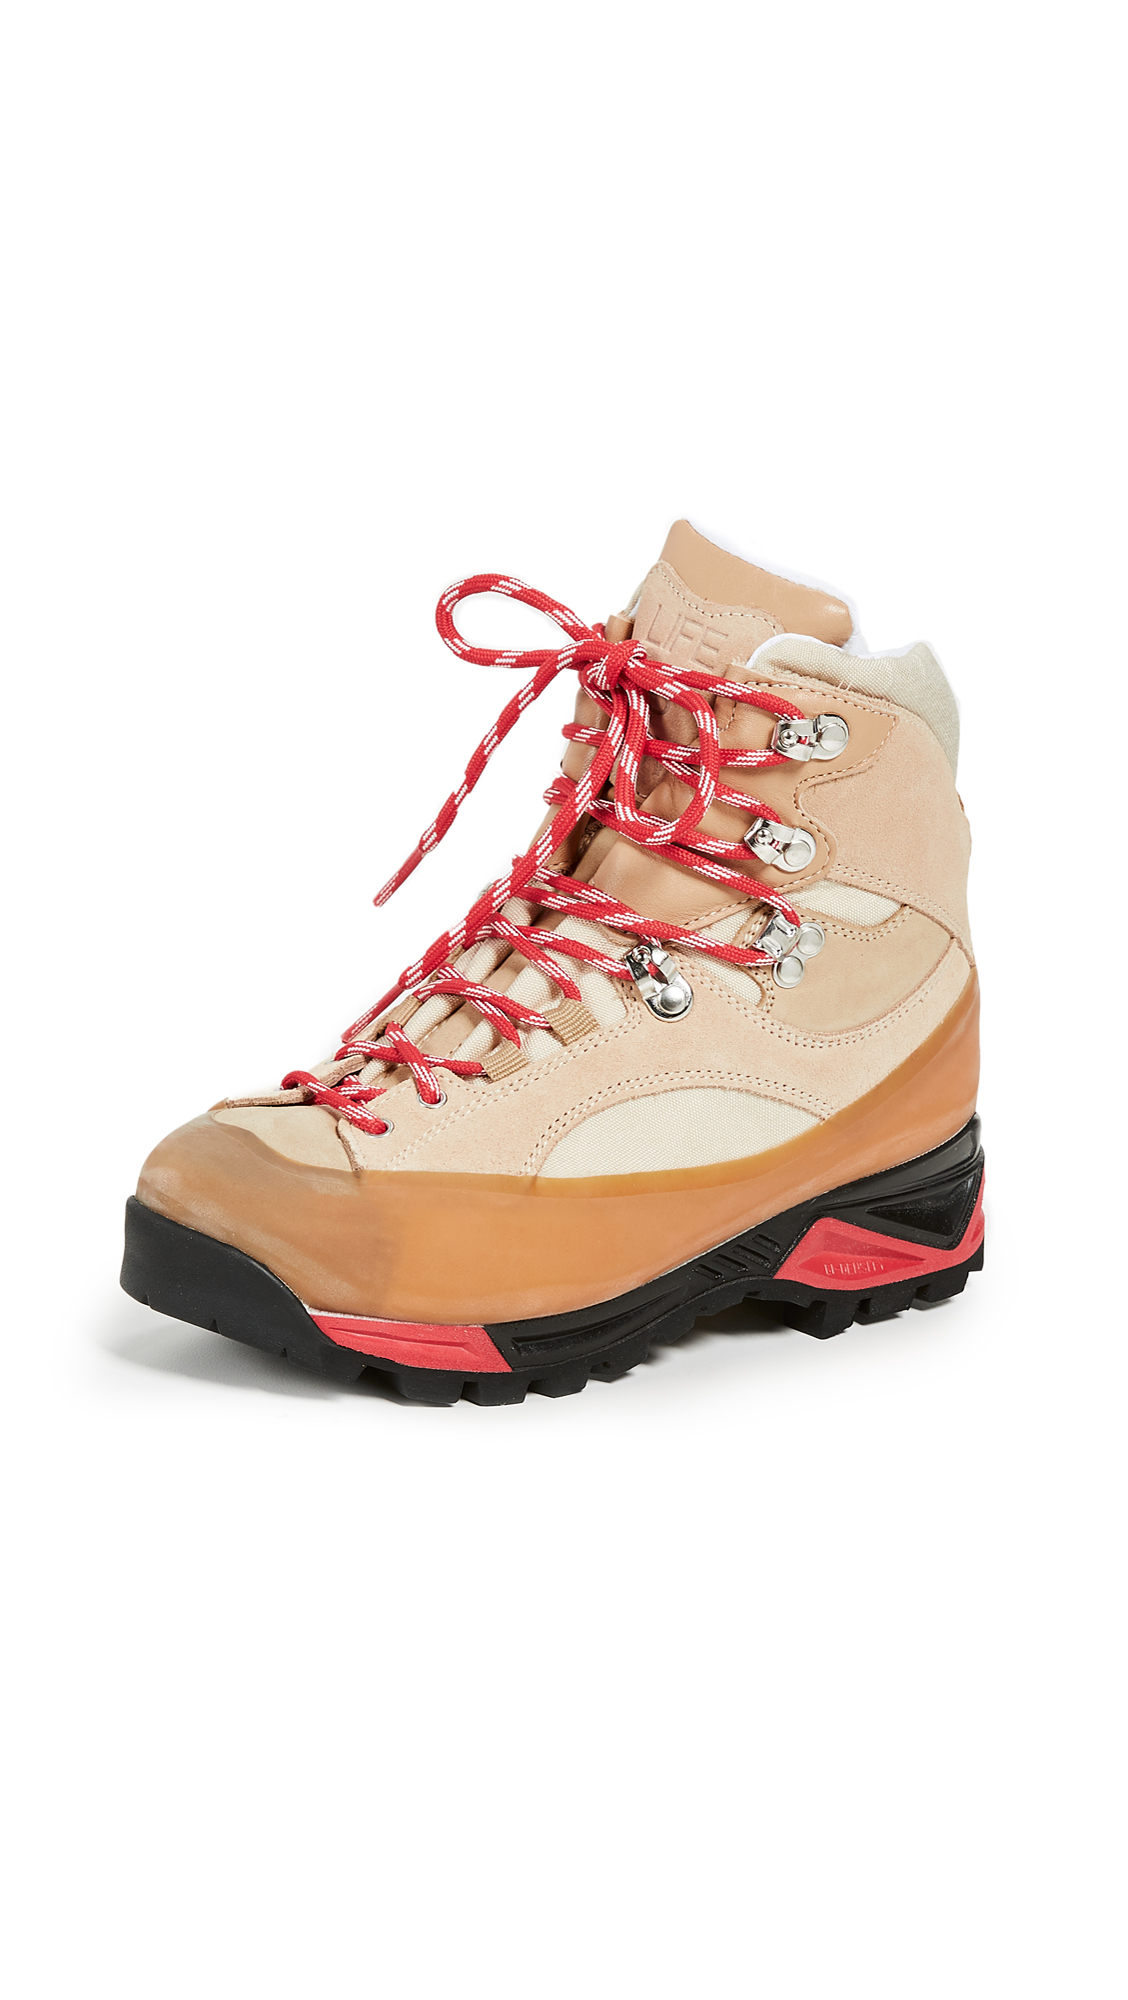 Sarai Suede Ankle Boots in Hazelnut